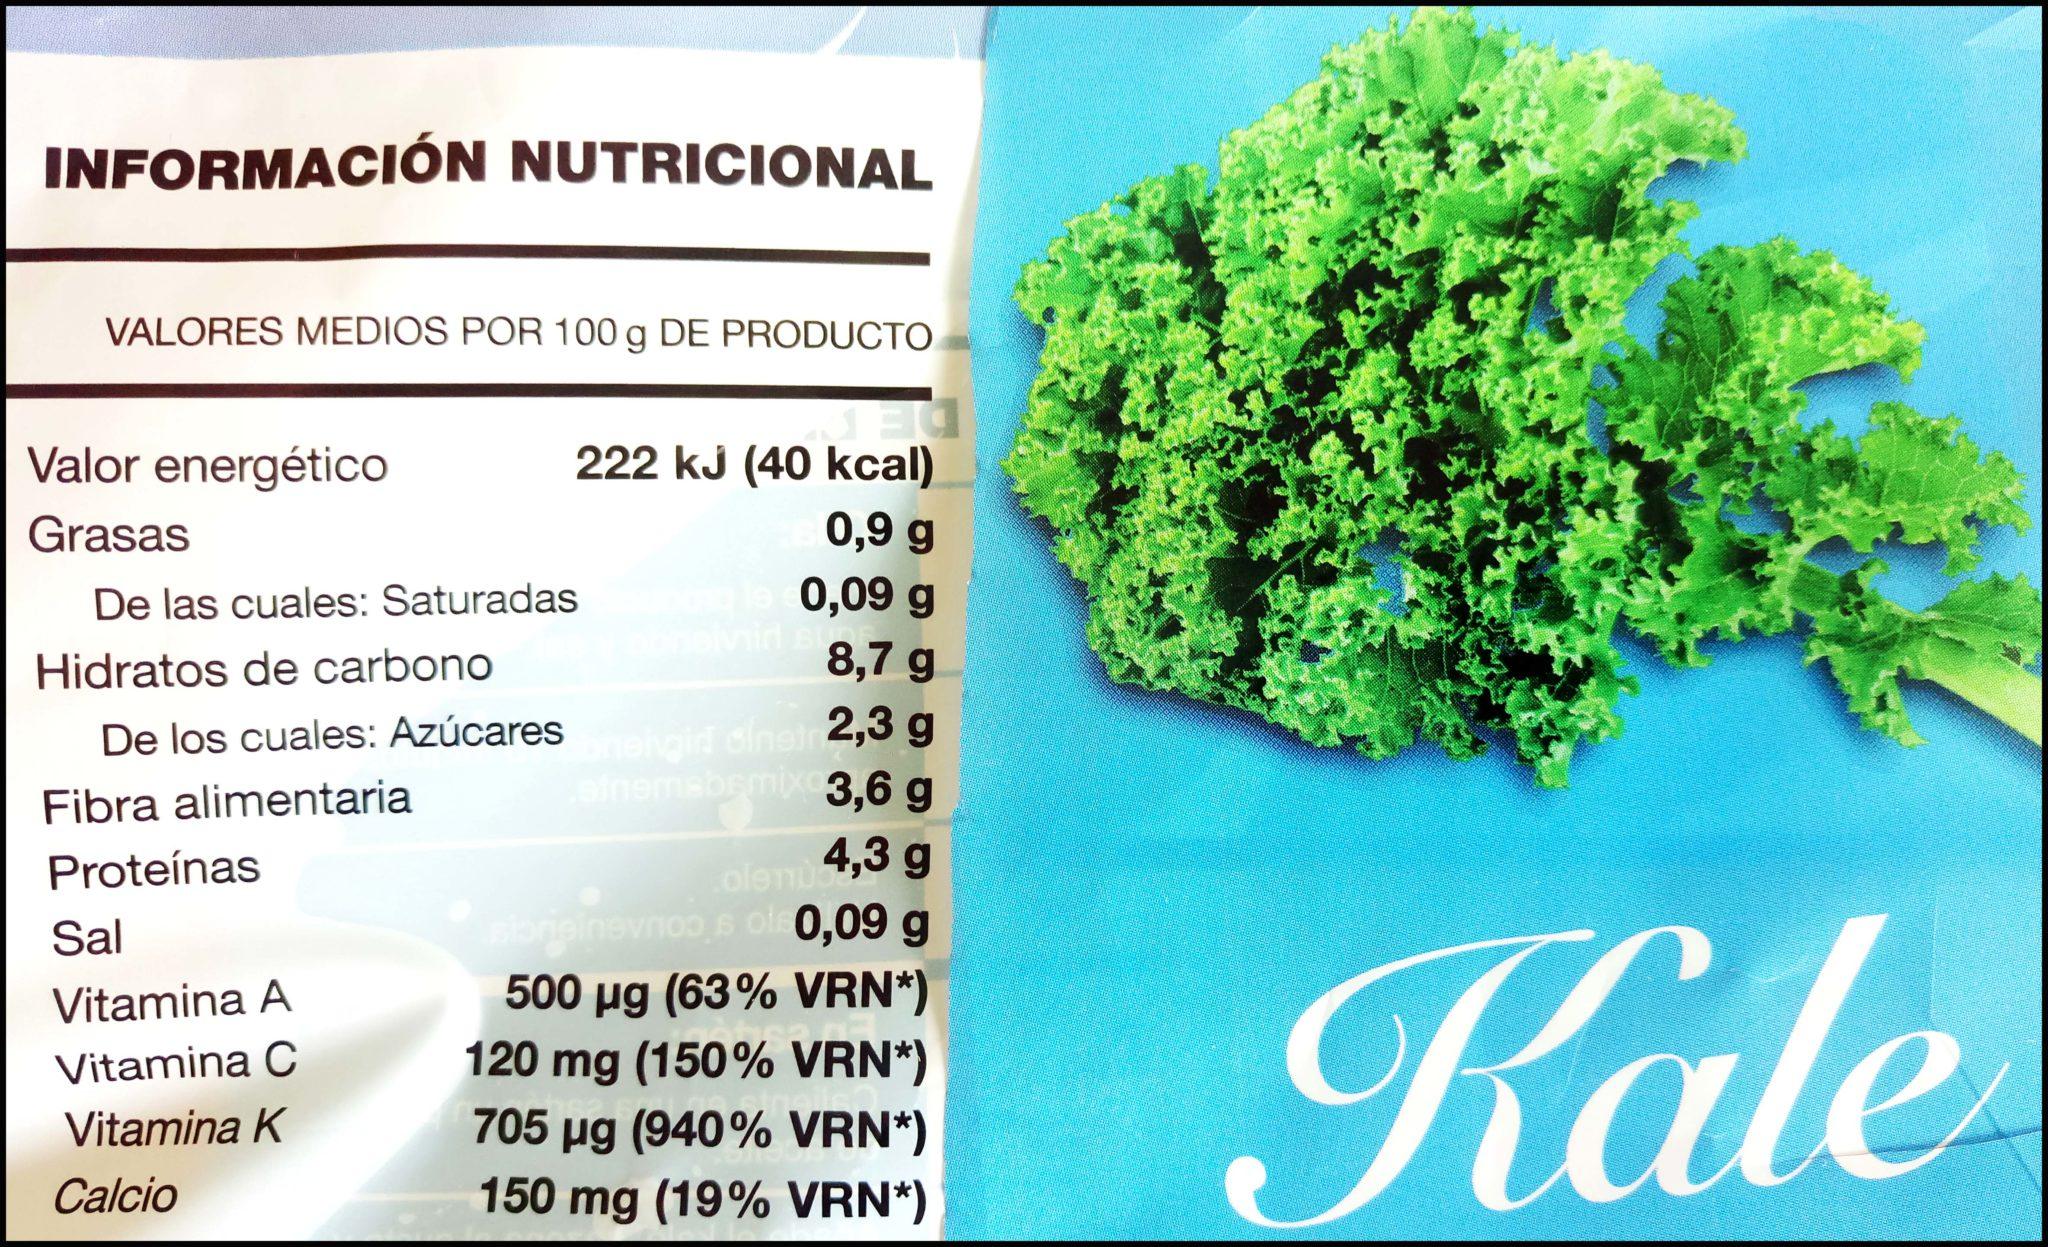 Valori Nutrizionali Cavolo Nero Kale